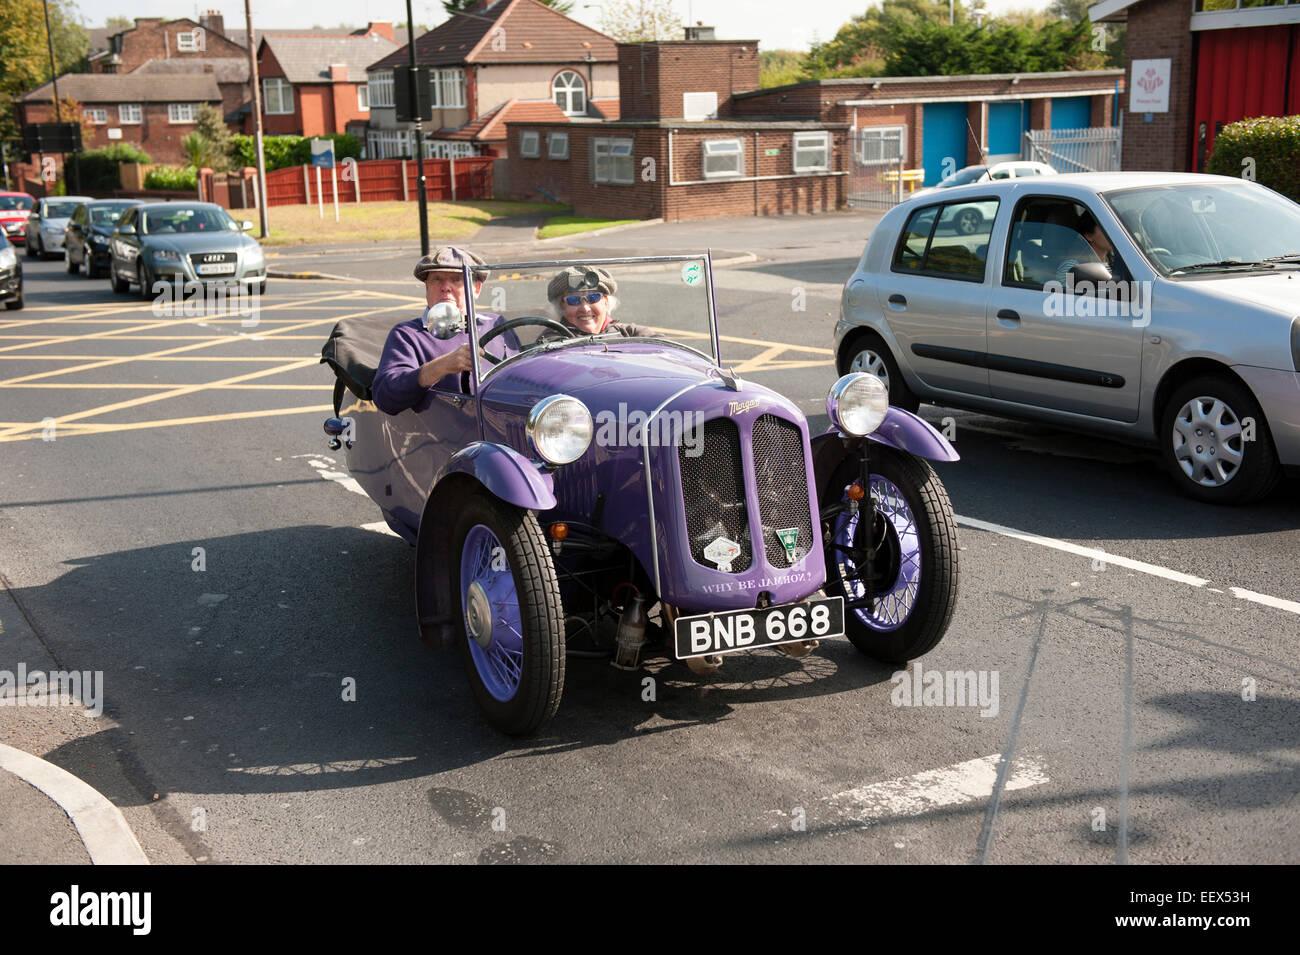 Old Vintage 3 Wheeler Car Purple Morgan Stock Photo 78021429 Alamy